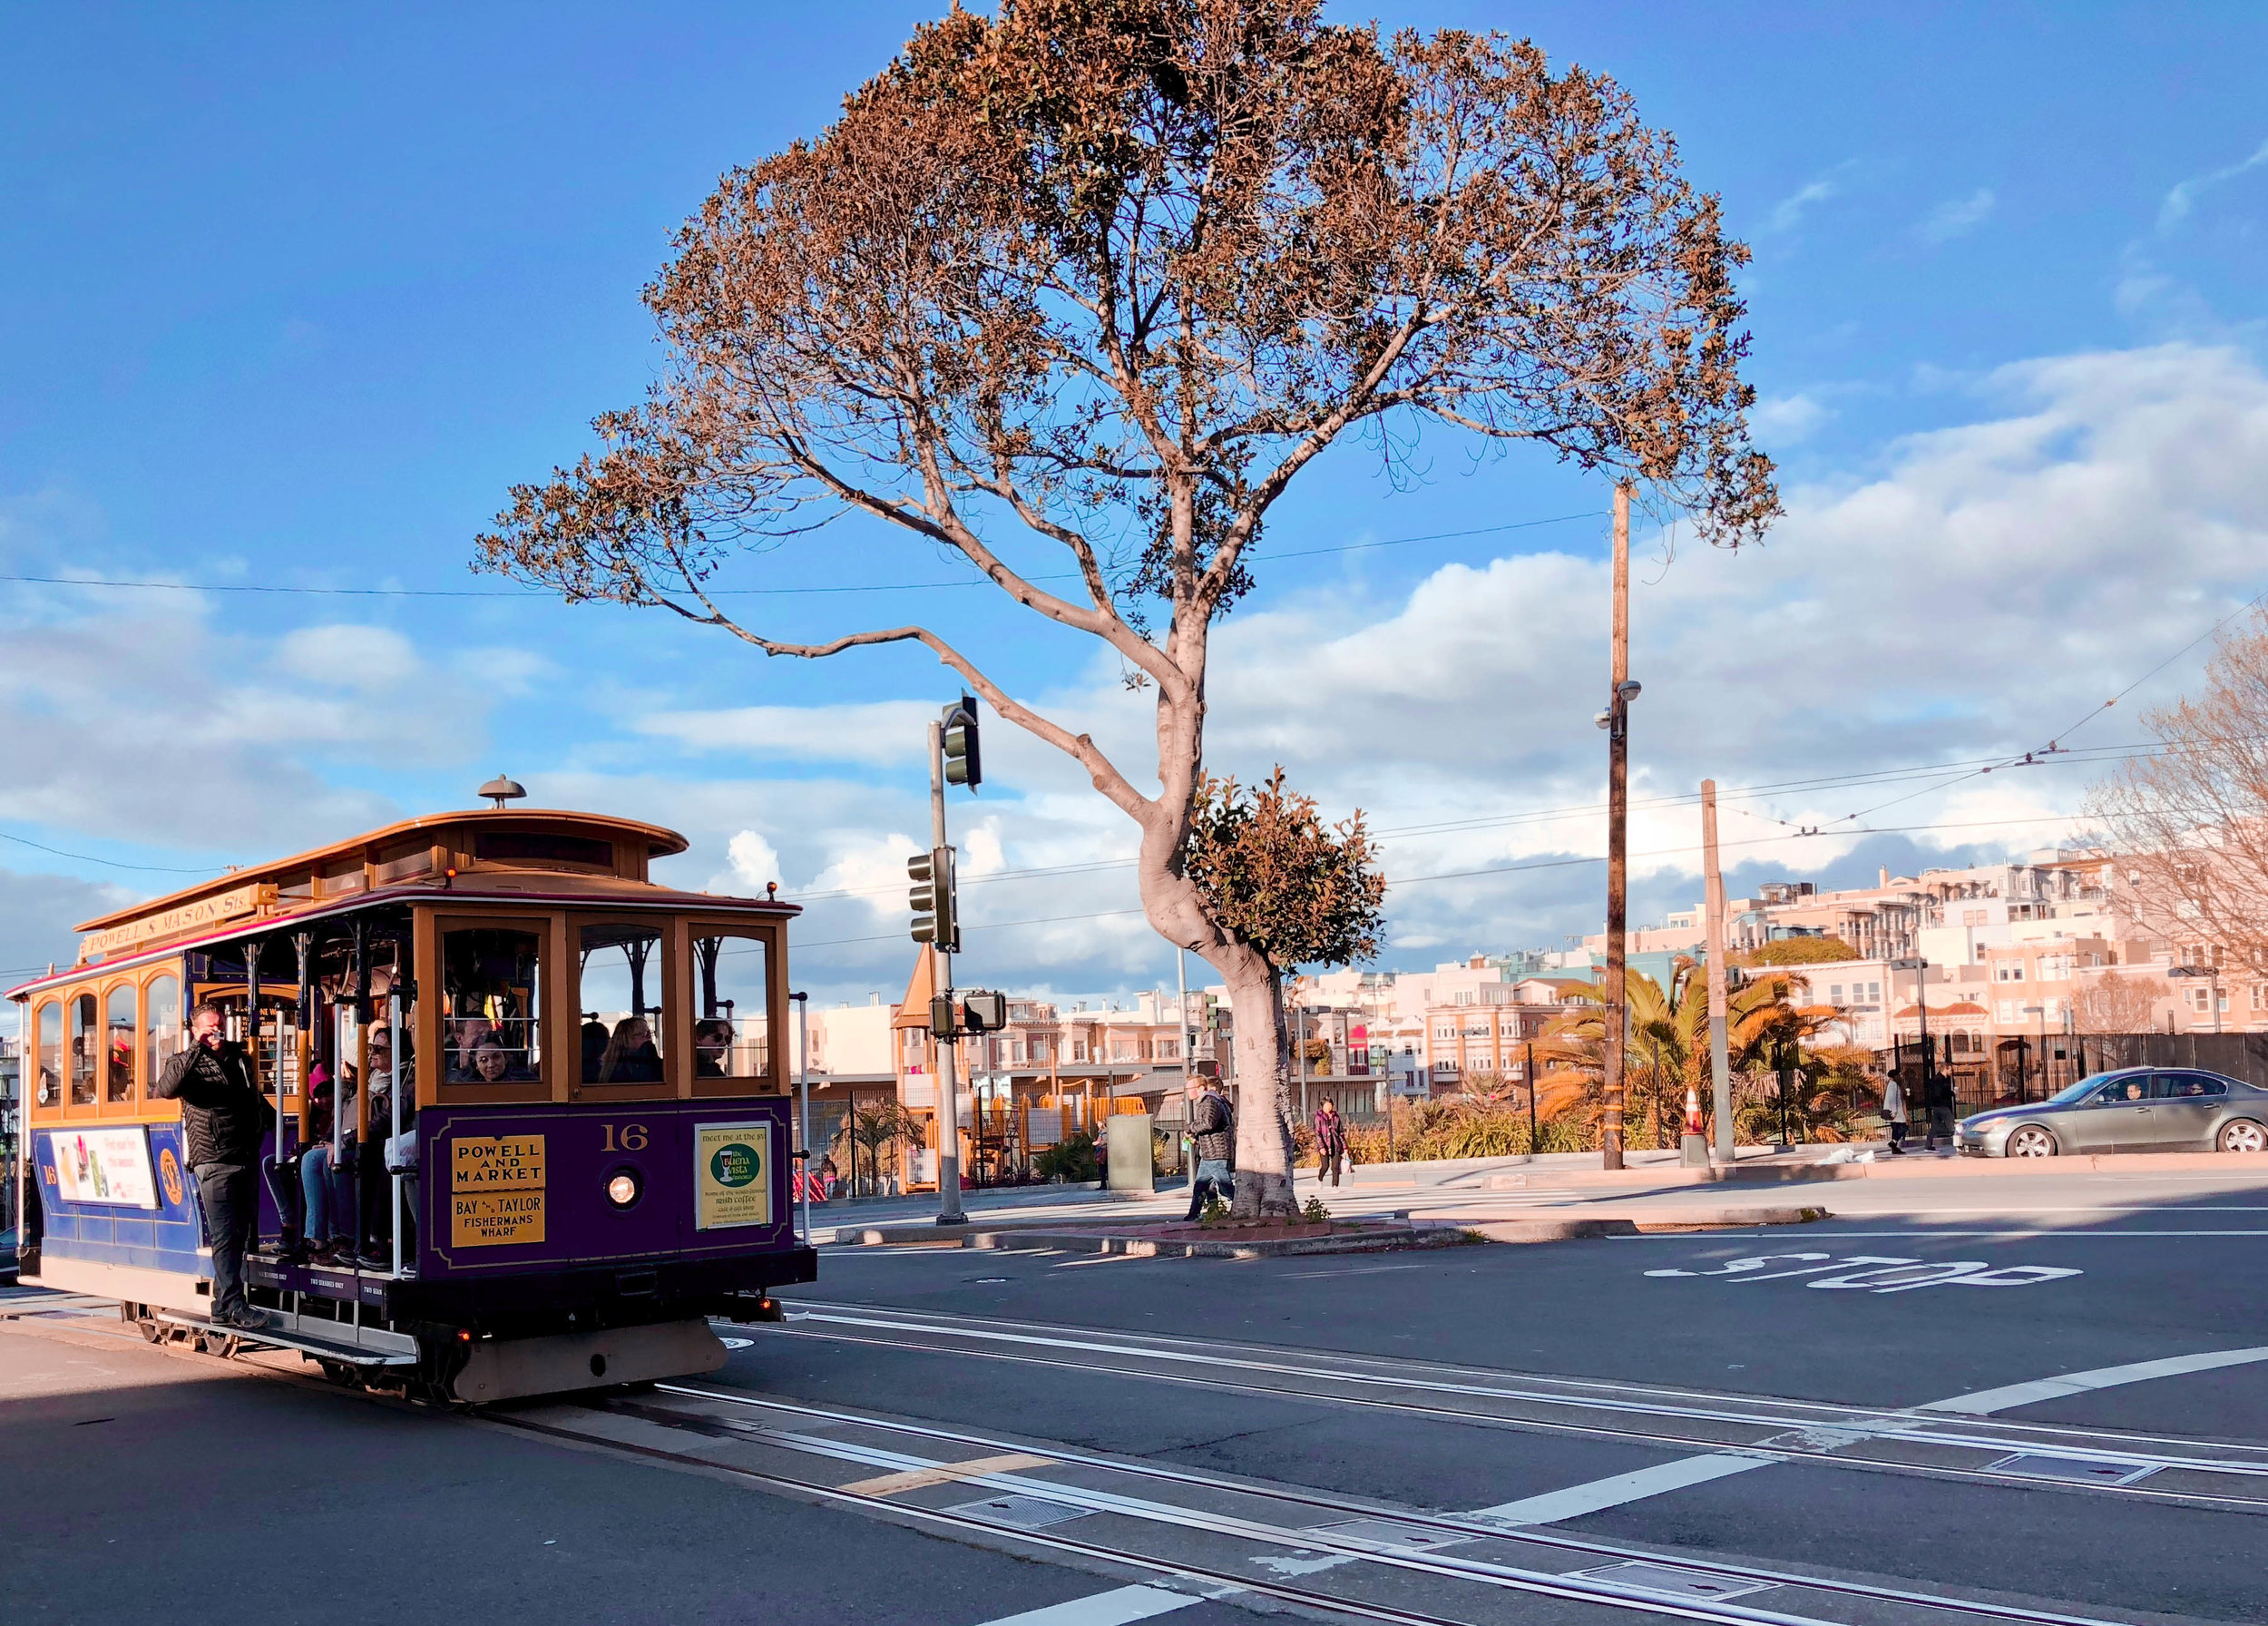 Powell-Mason cable car